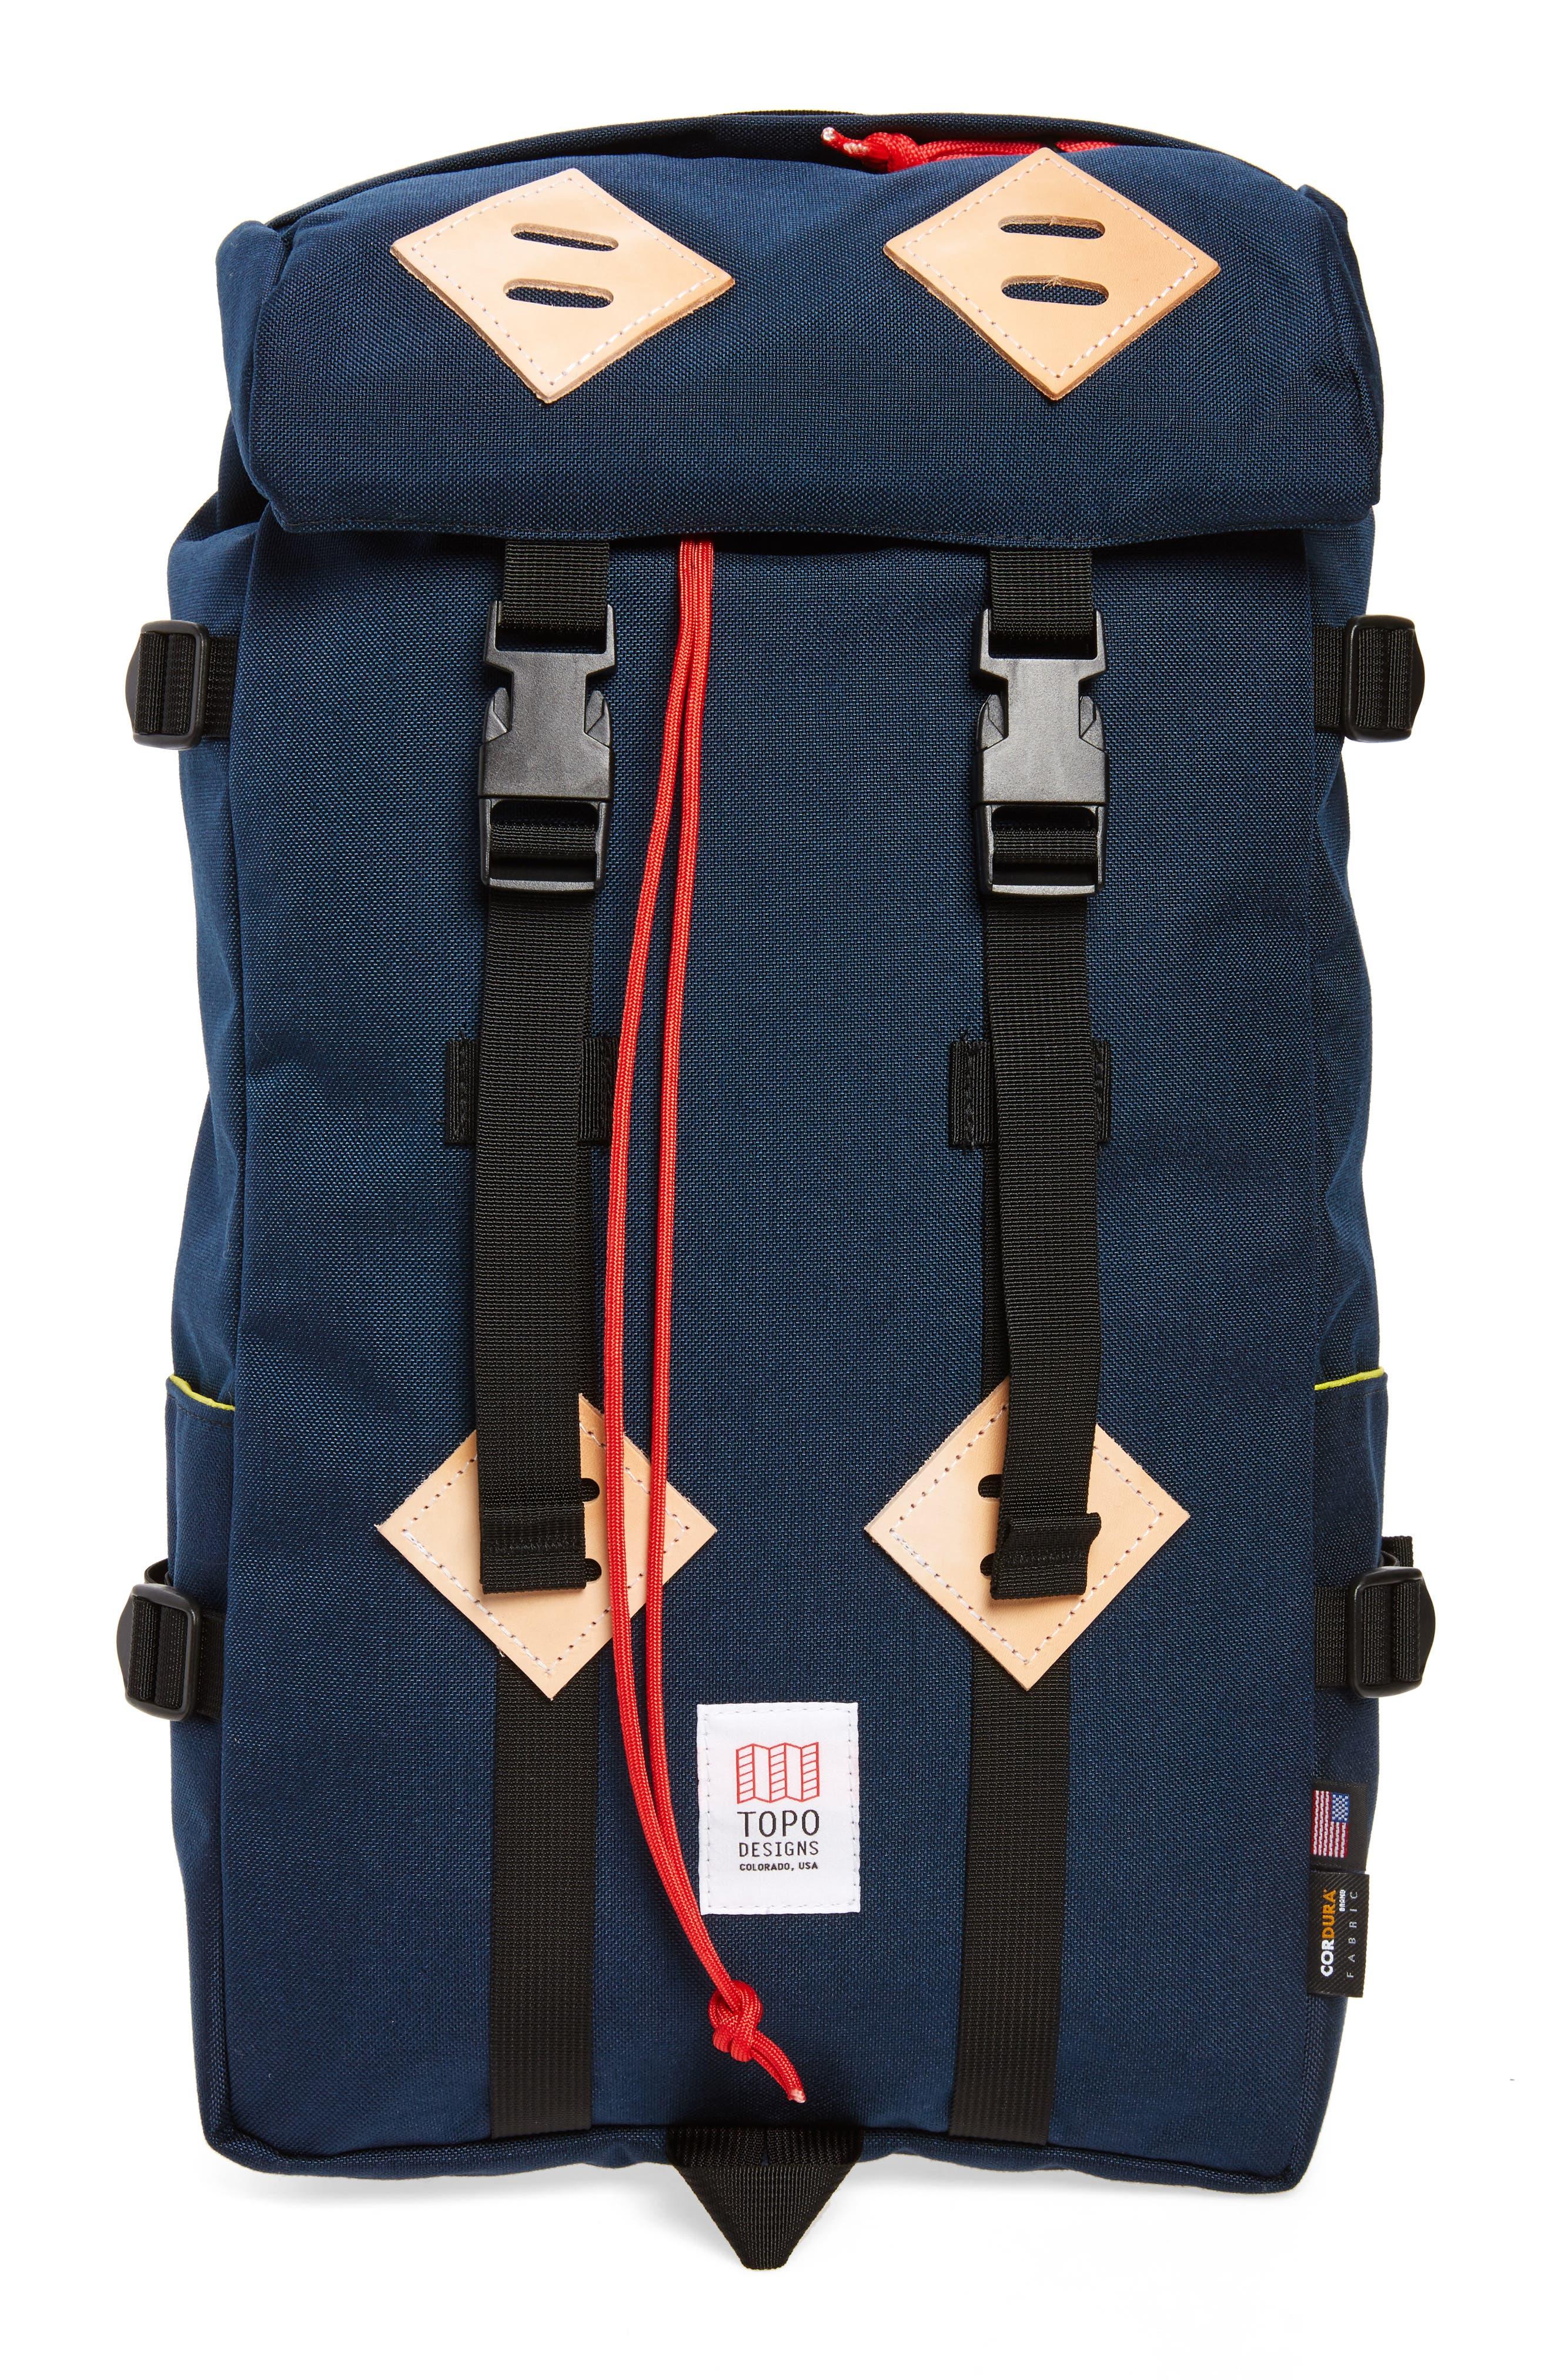 Topo Designs 'Klettersack' Backpack